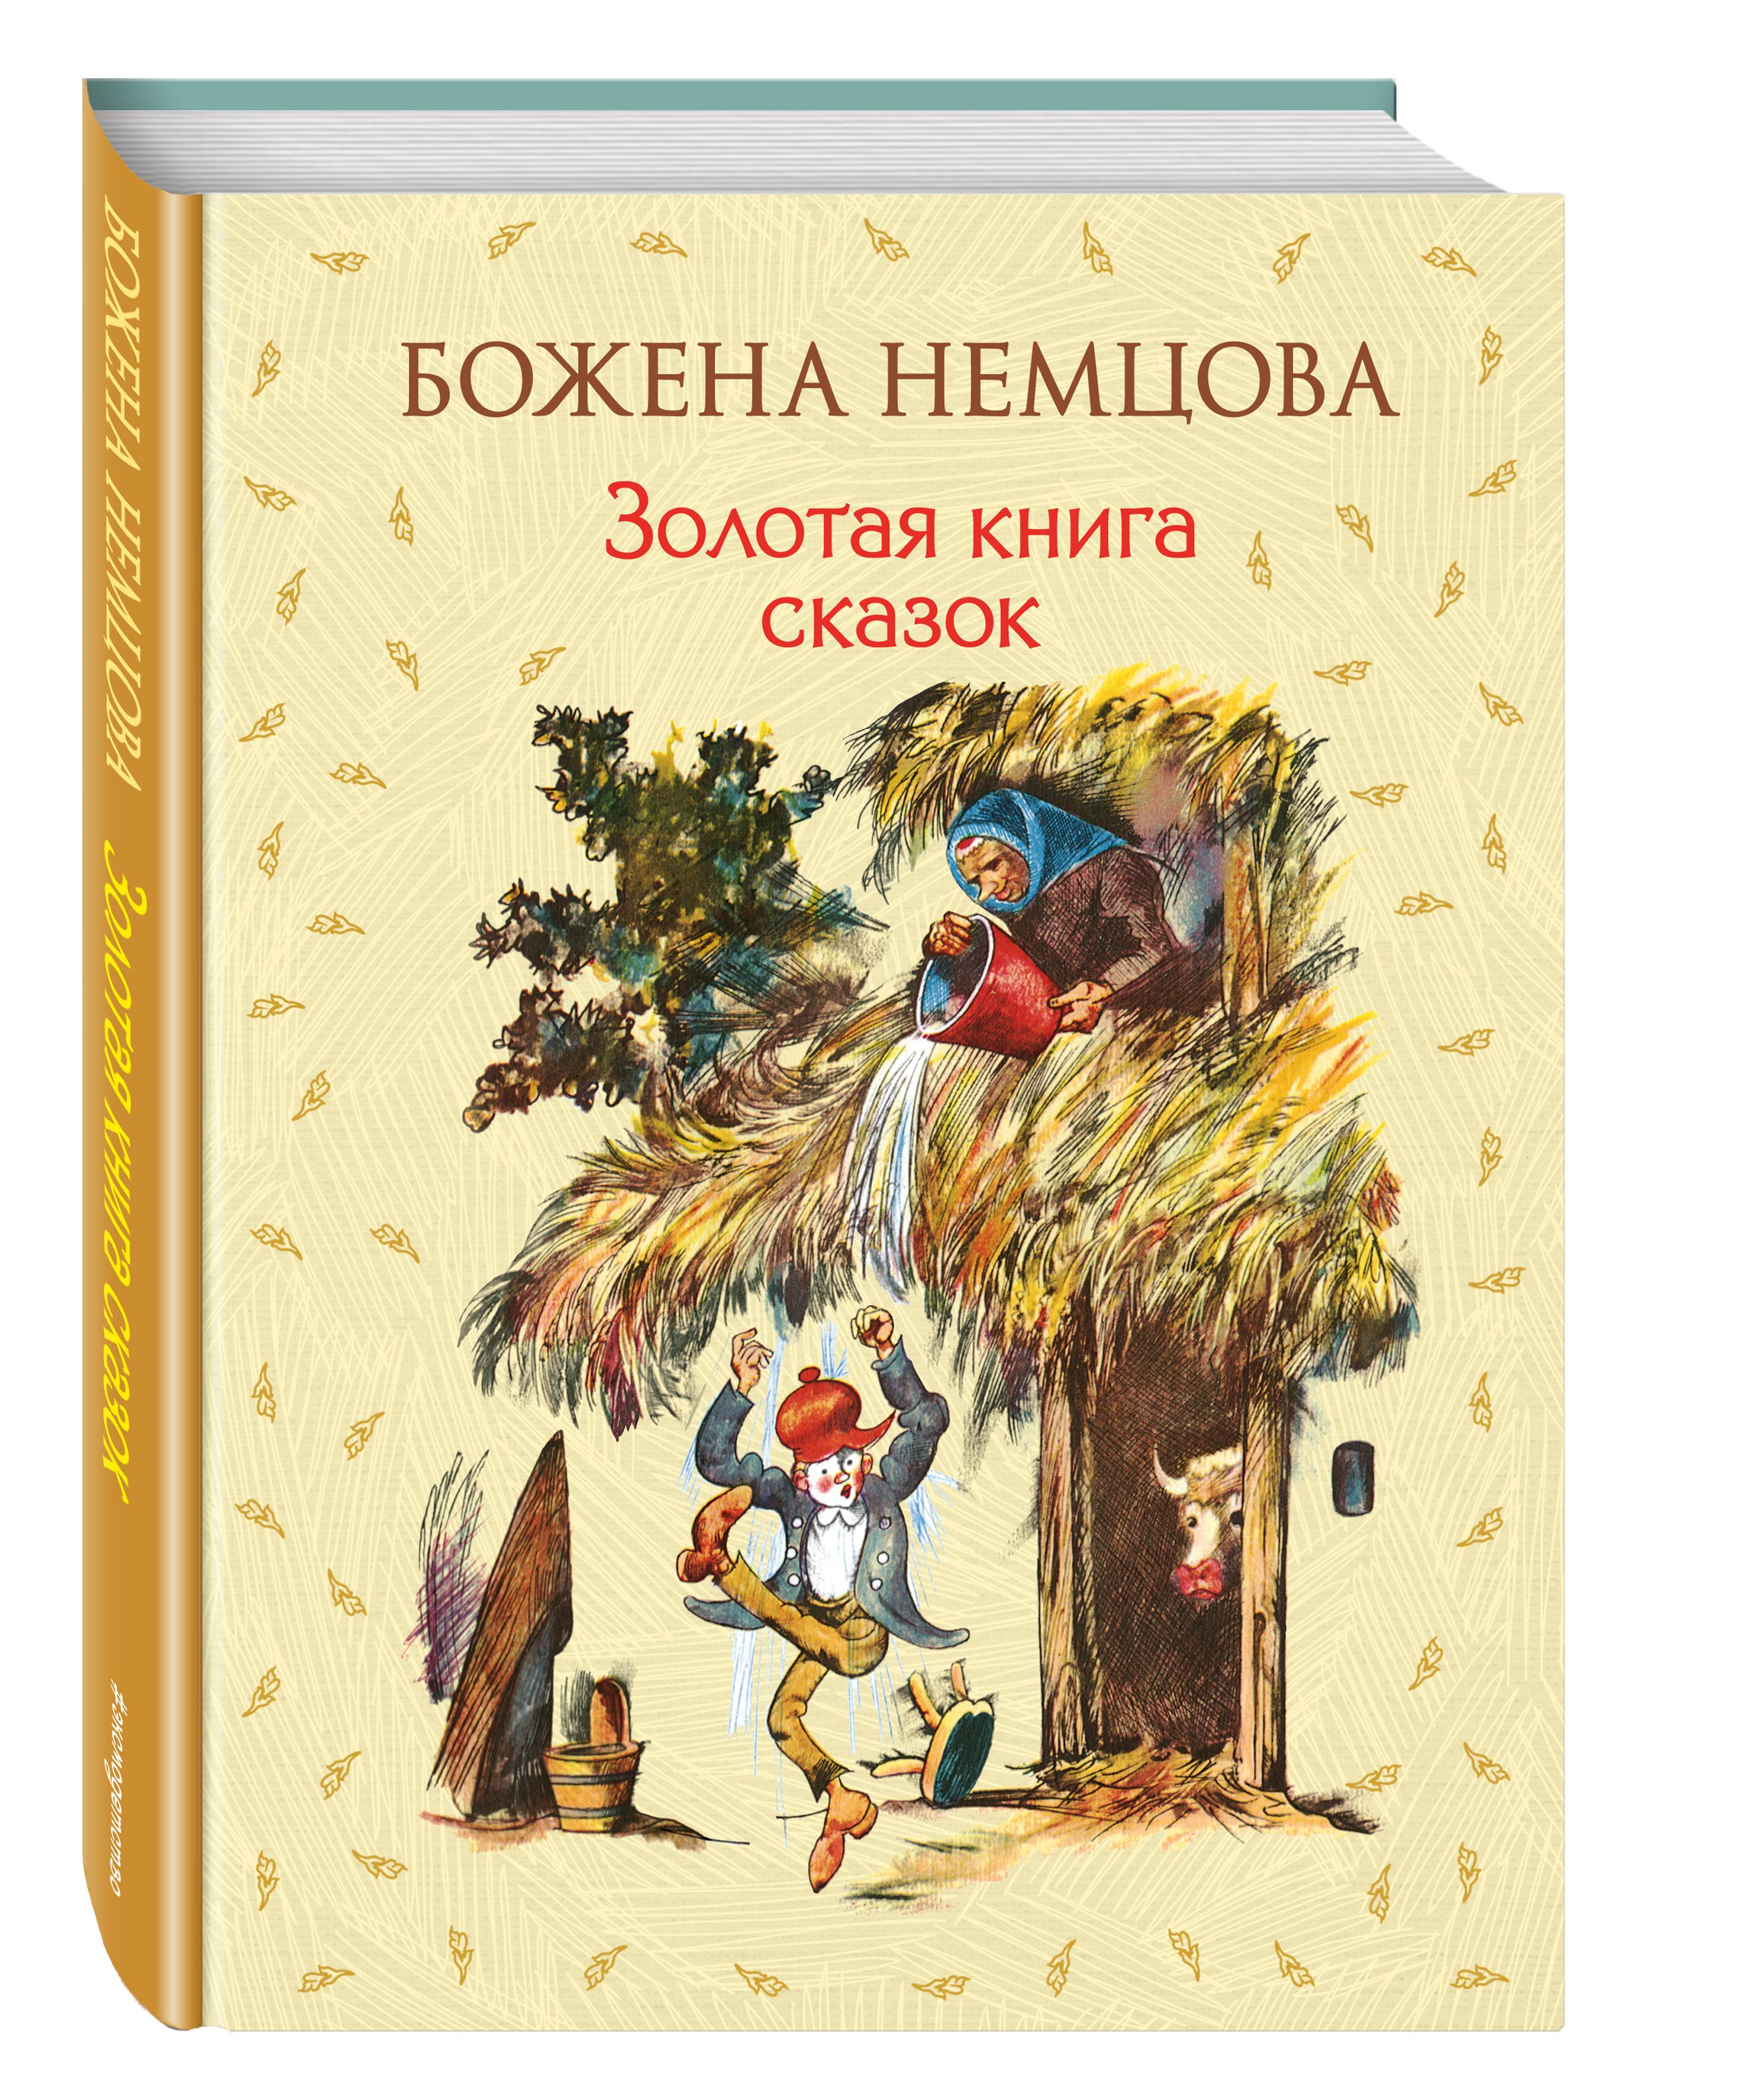 Божена Немцова Золотая книга сказок ночь сказок 2018 11 10t18 00